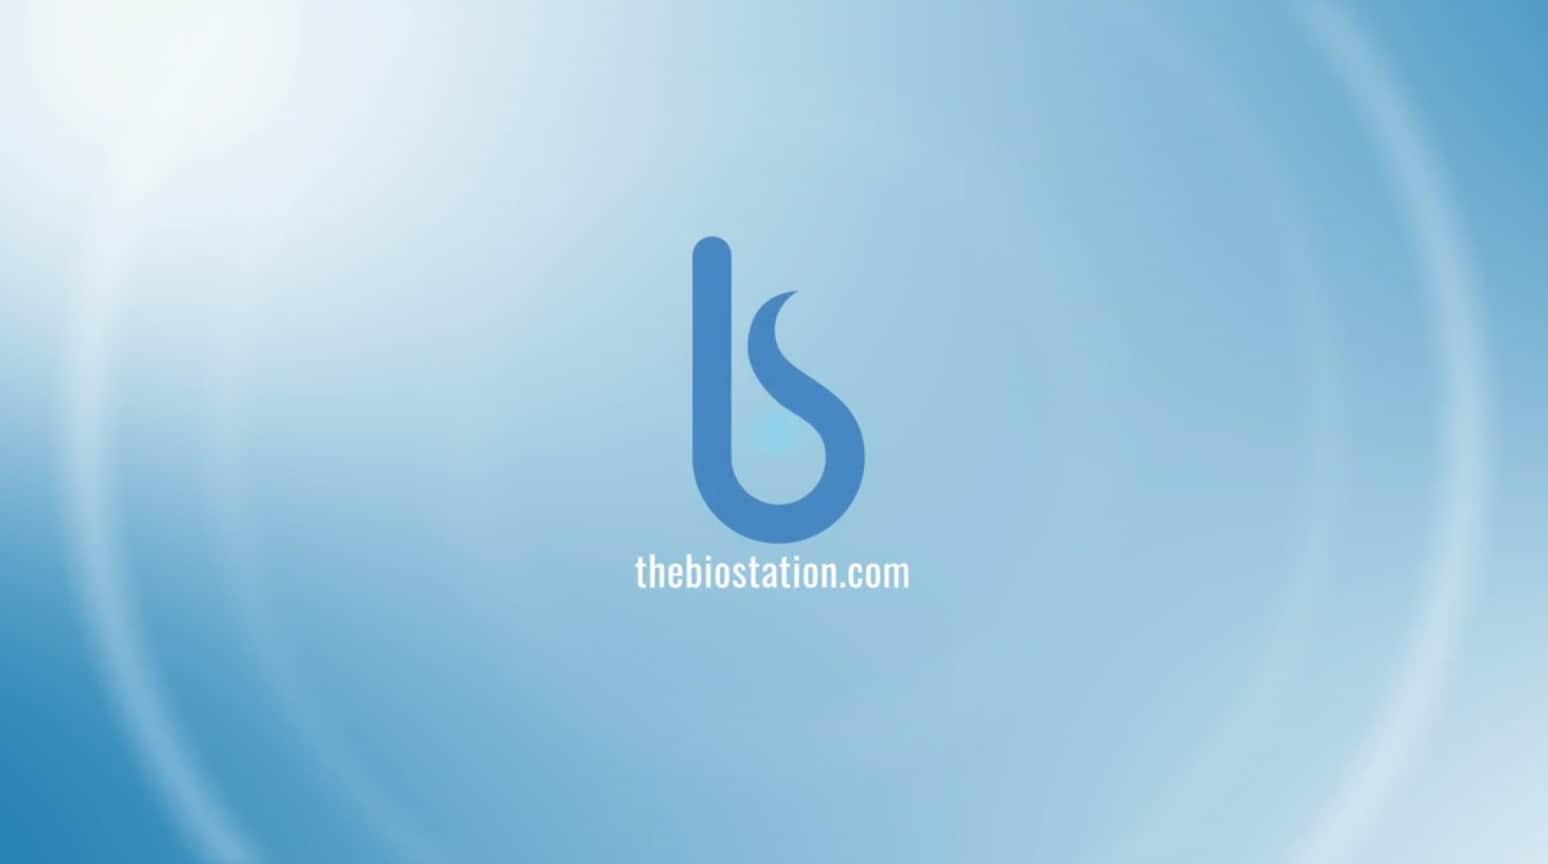 the biostation in Delray Beach, FL | the biostation